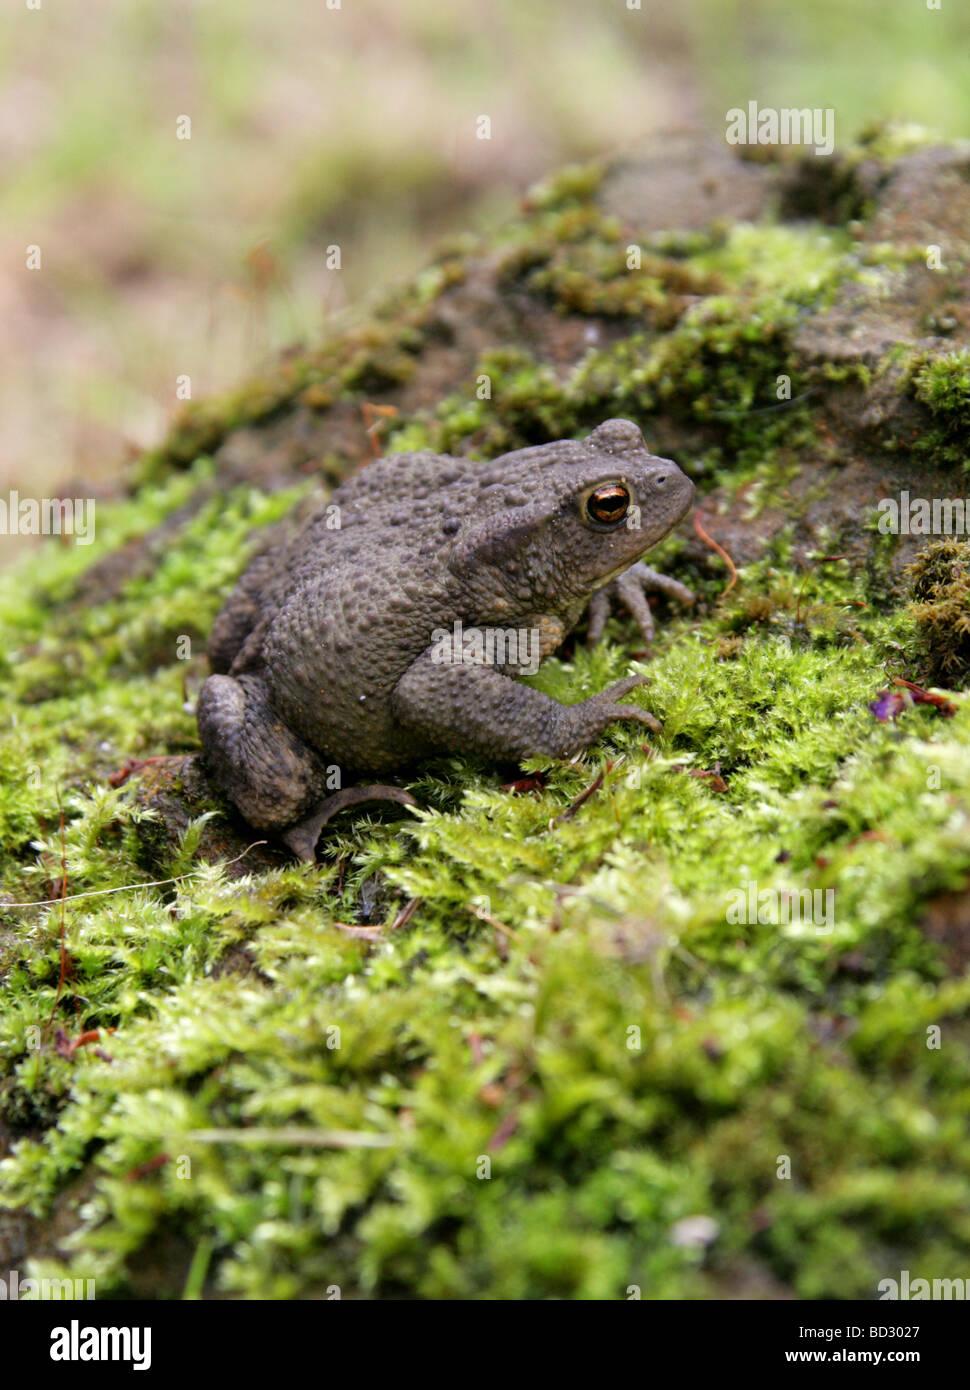 European or Common Toad, Bufo bufo, Bufonidae. UK Stock Photo